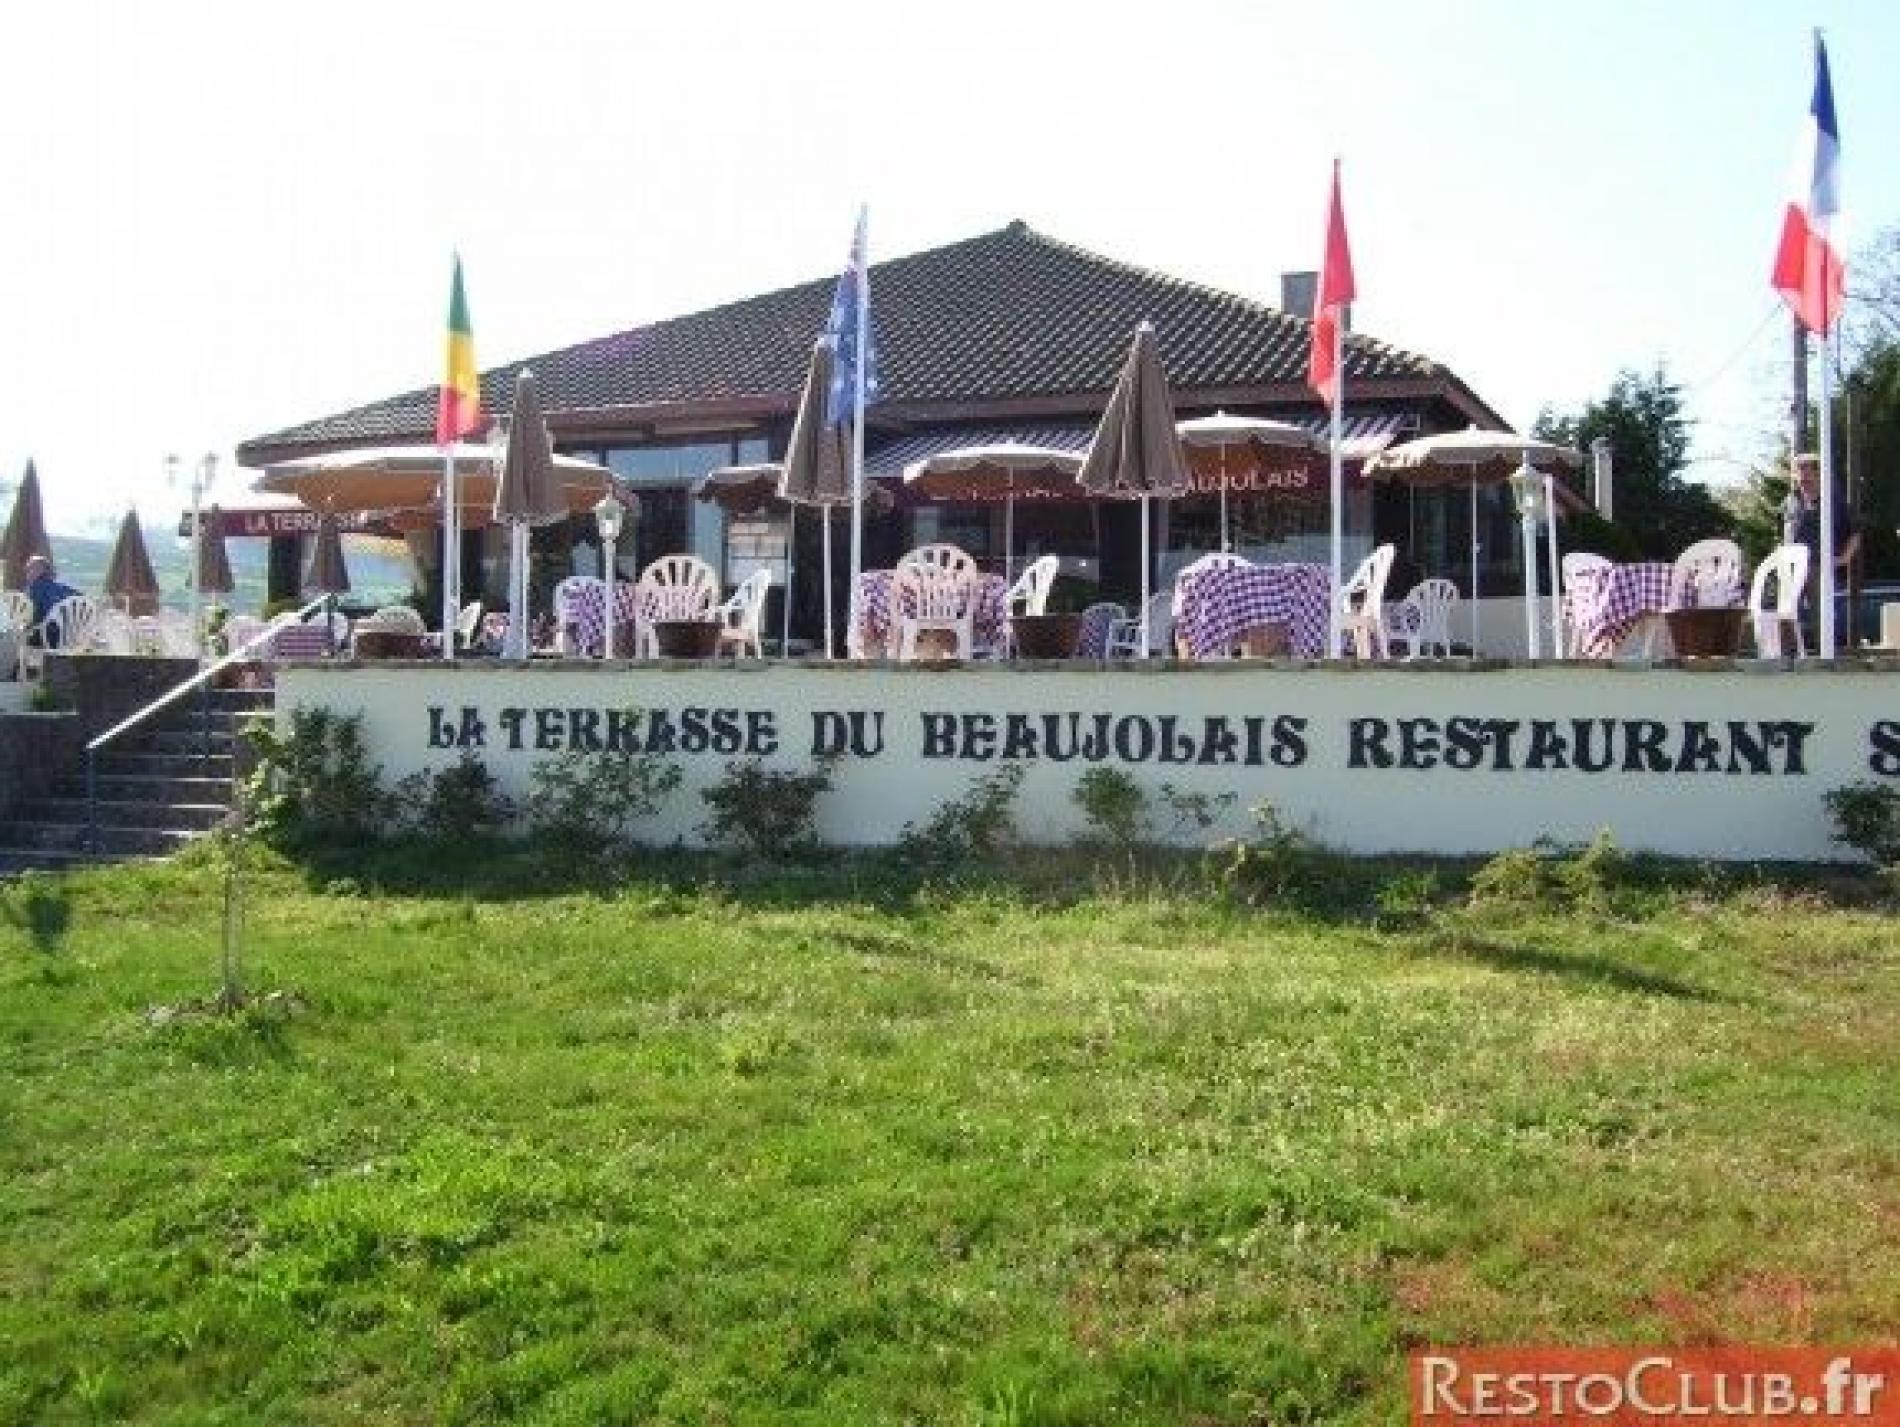 La Terrasse du Beaujolais